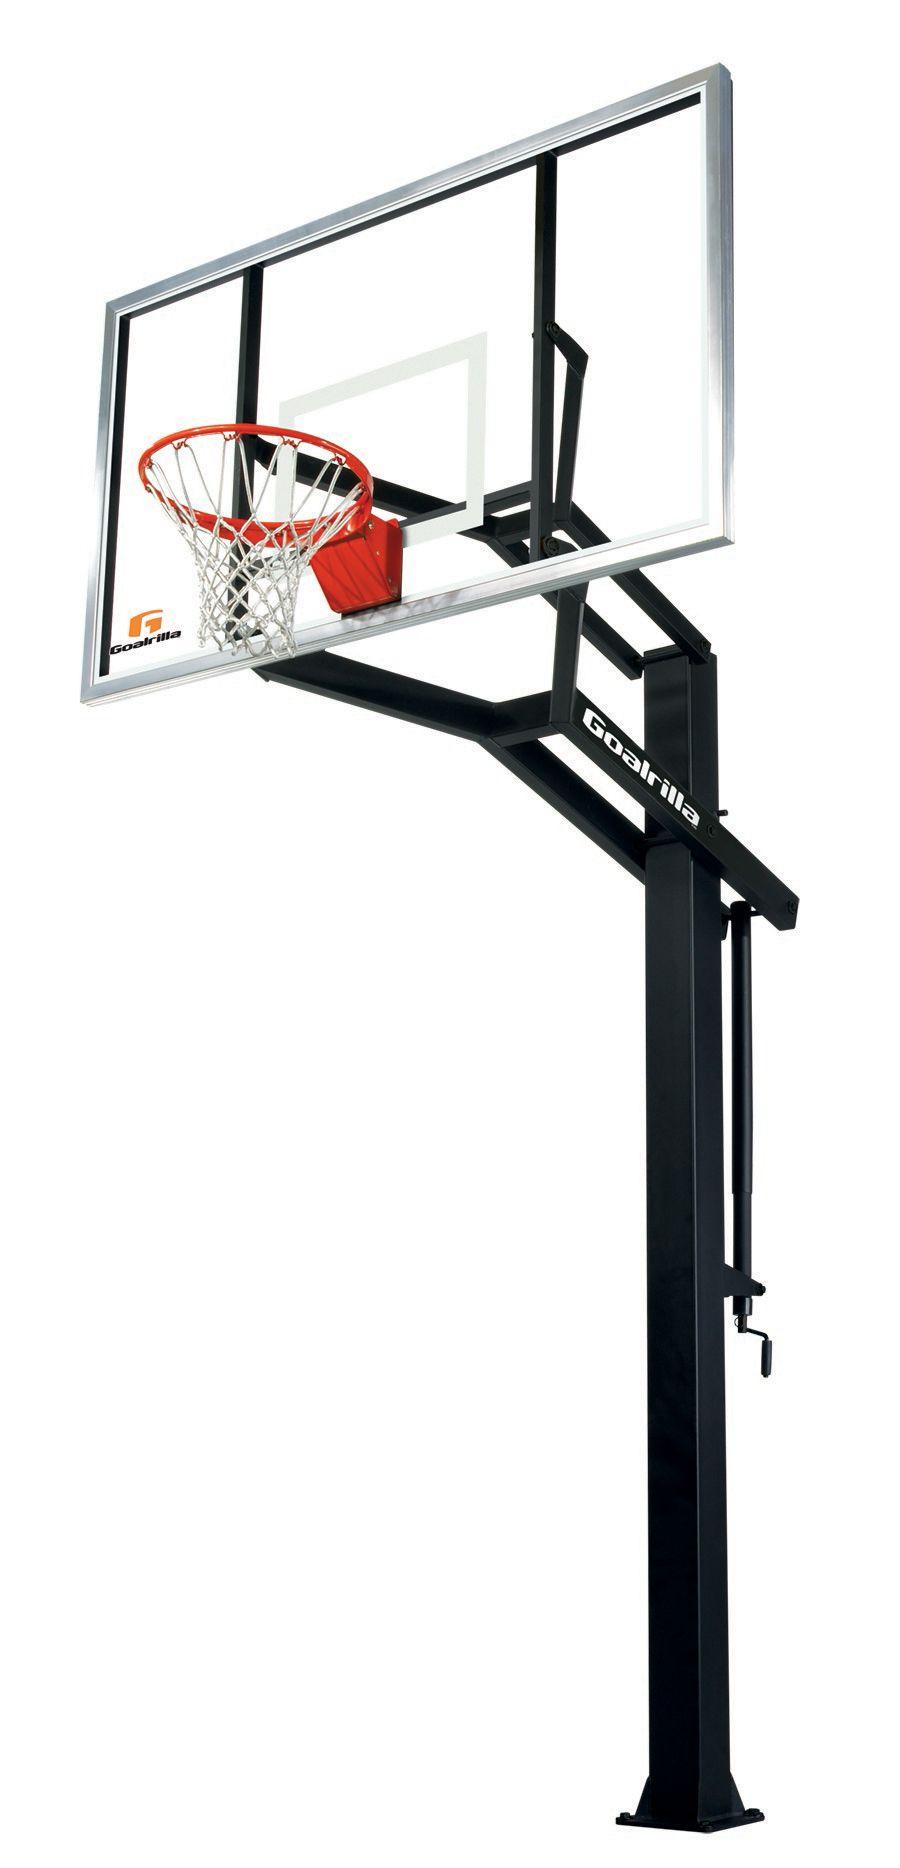 Goalrilla Gsi Basketball Systems Basketball Hoops Basketball